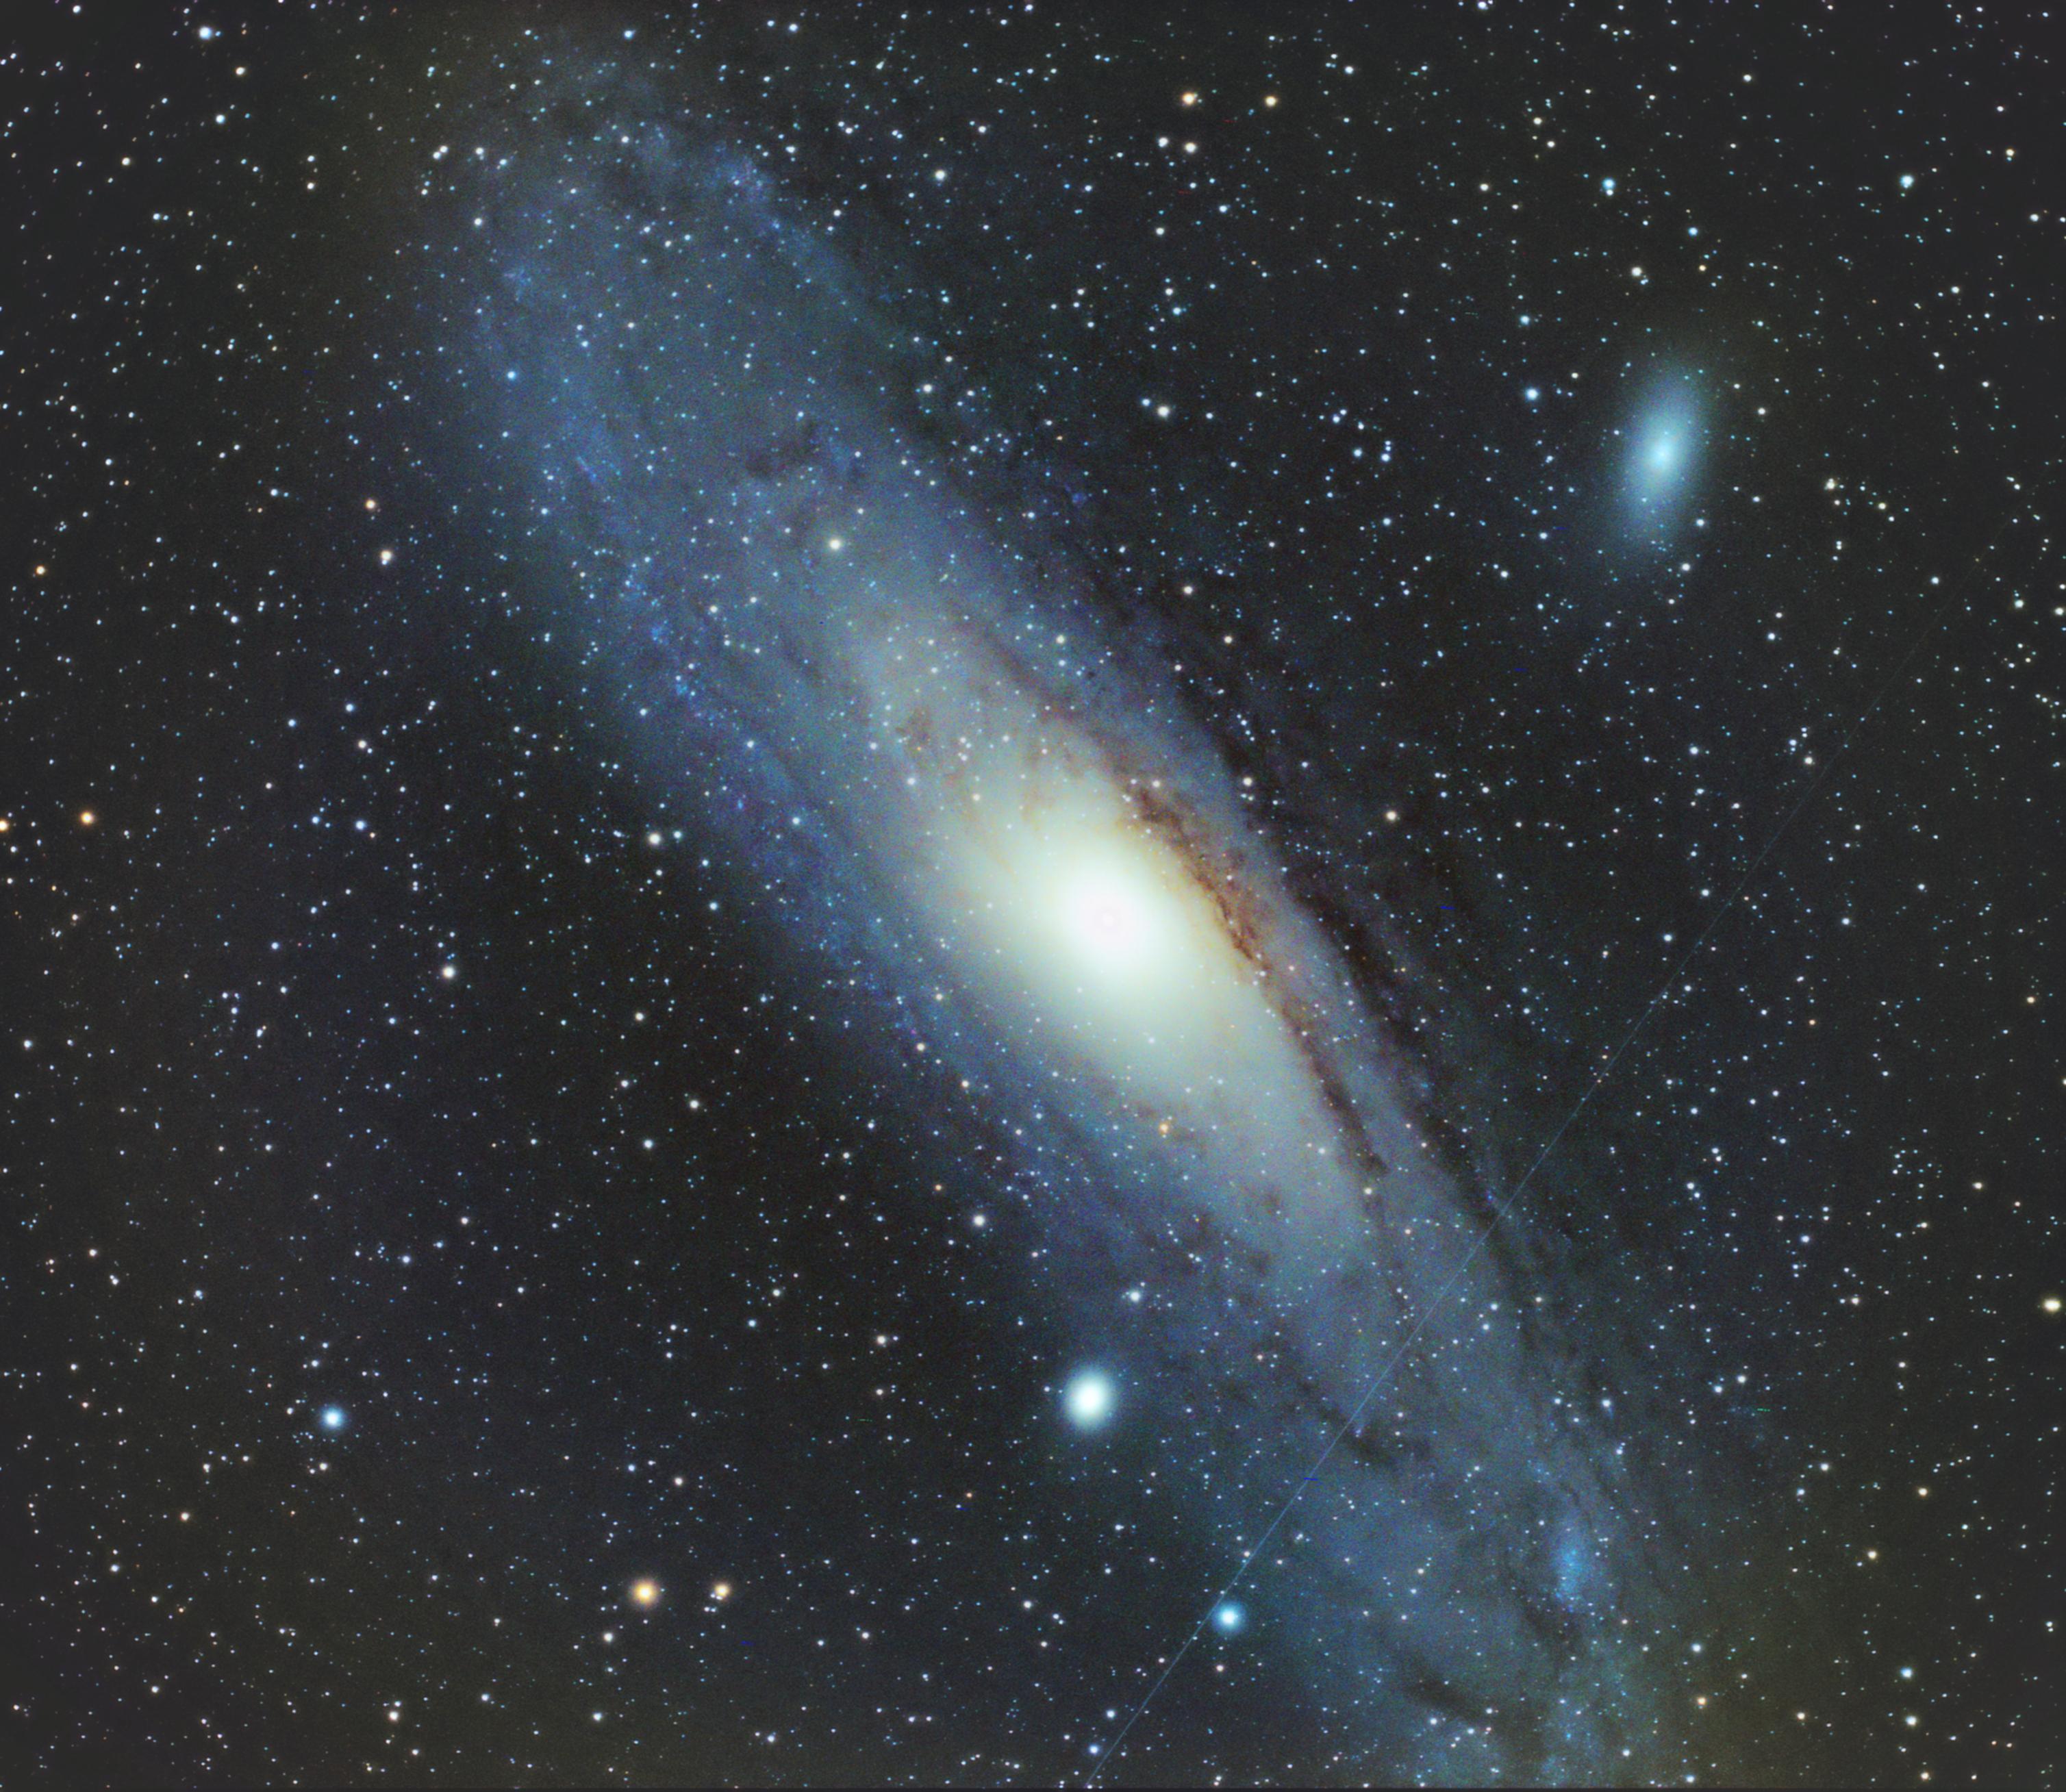 M31_20170126_5x90sec_Veloce